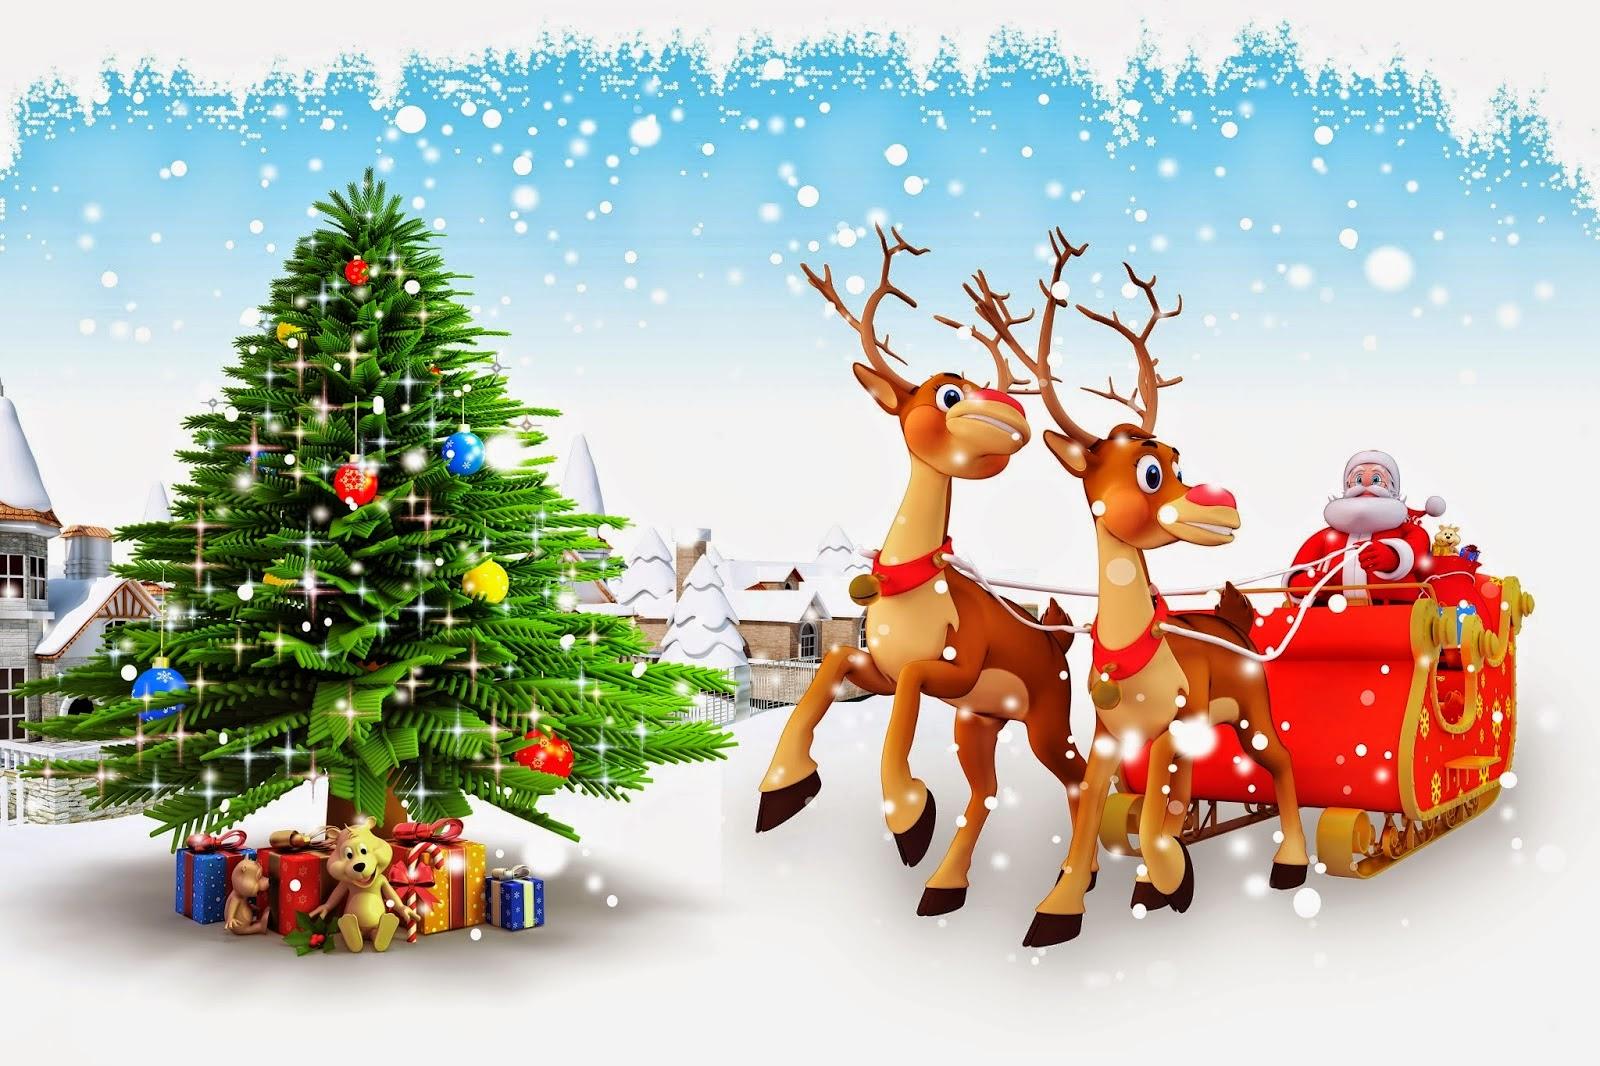 http://www.chiquiplanet.com/memory/christmas-es.html